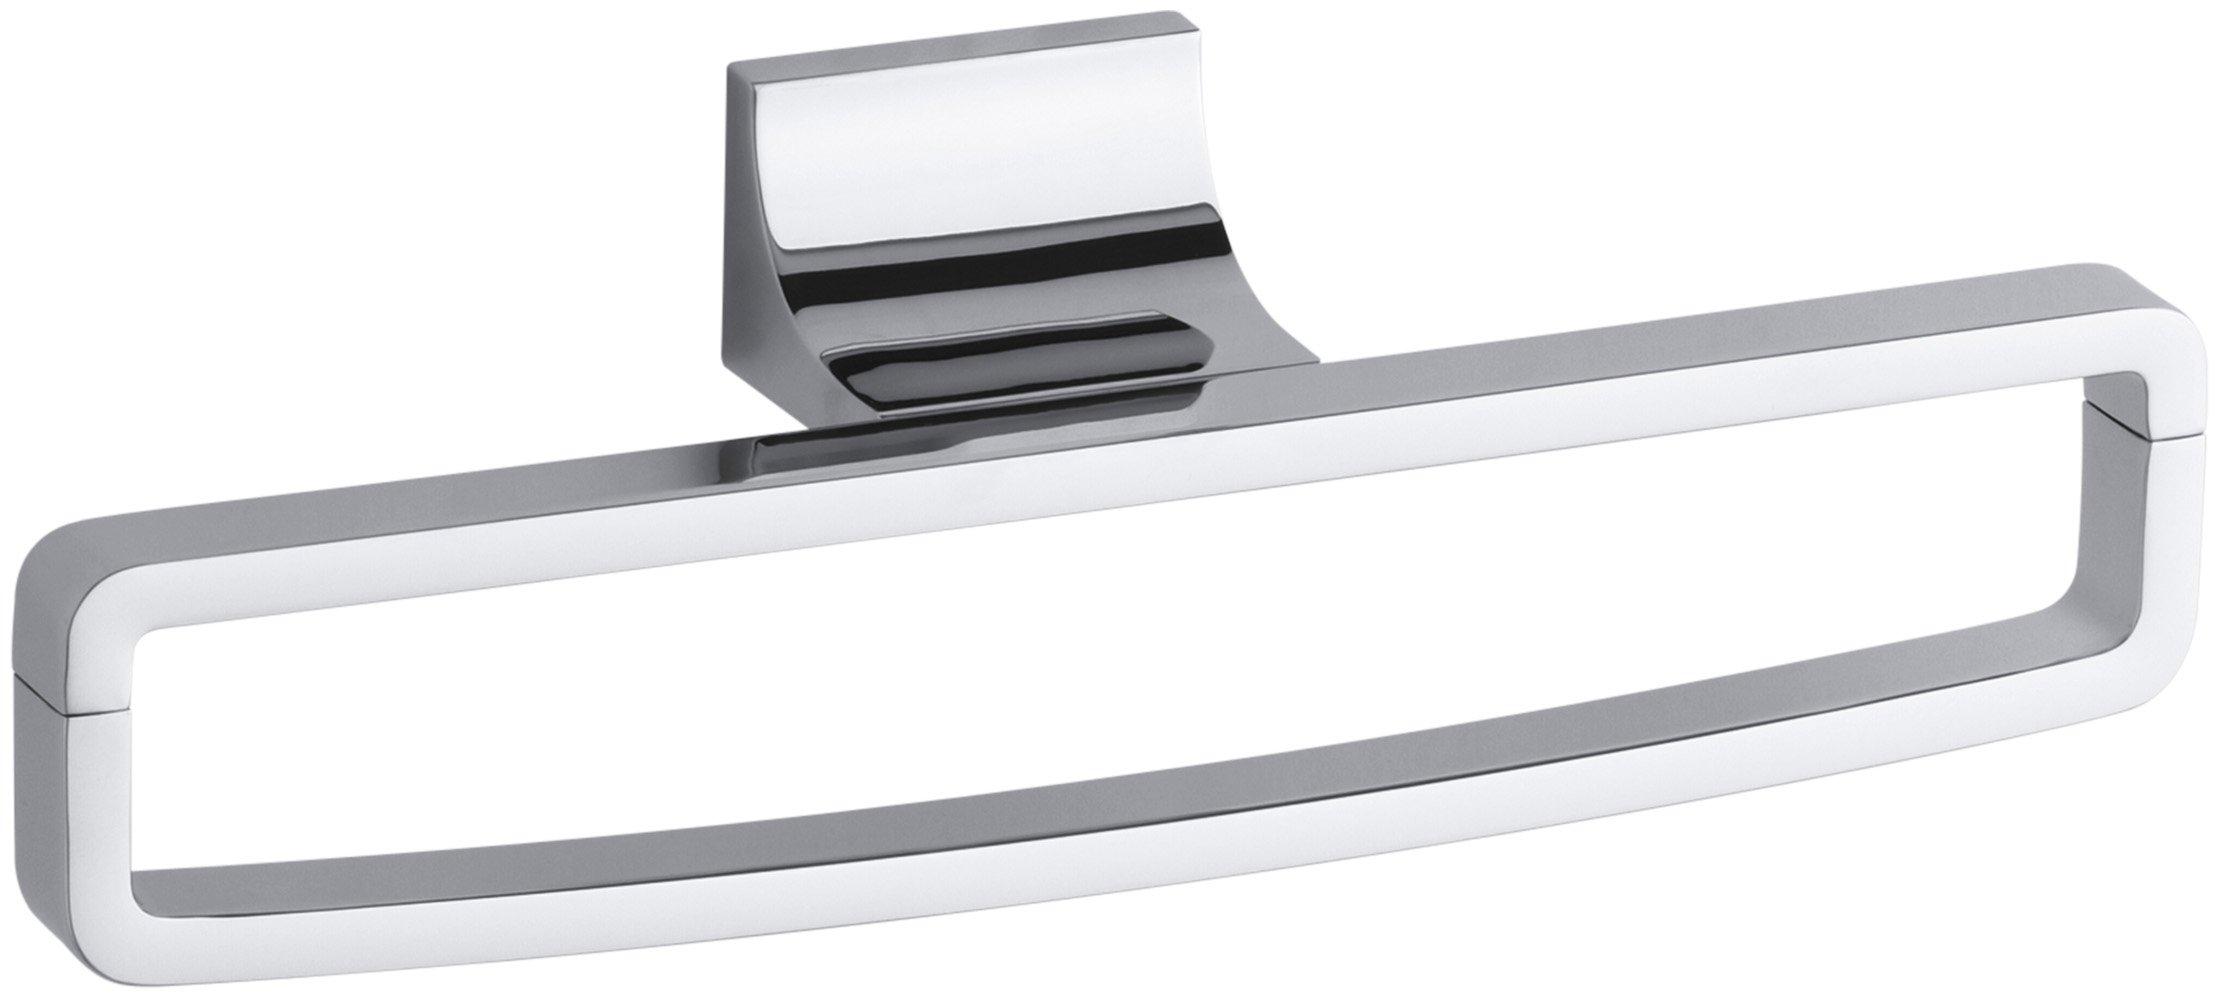 Kohler K-11587-CP Loure Towel Ring, Polished Chrome